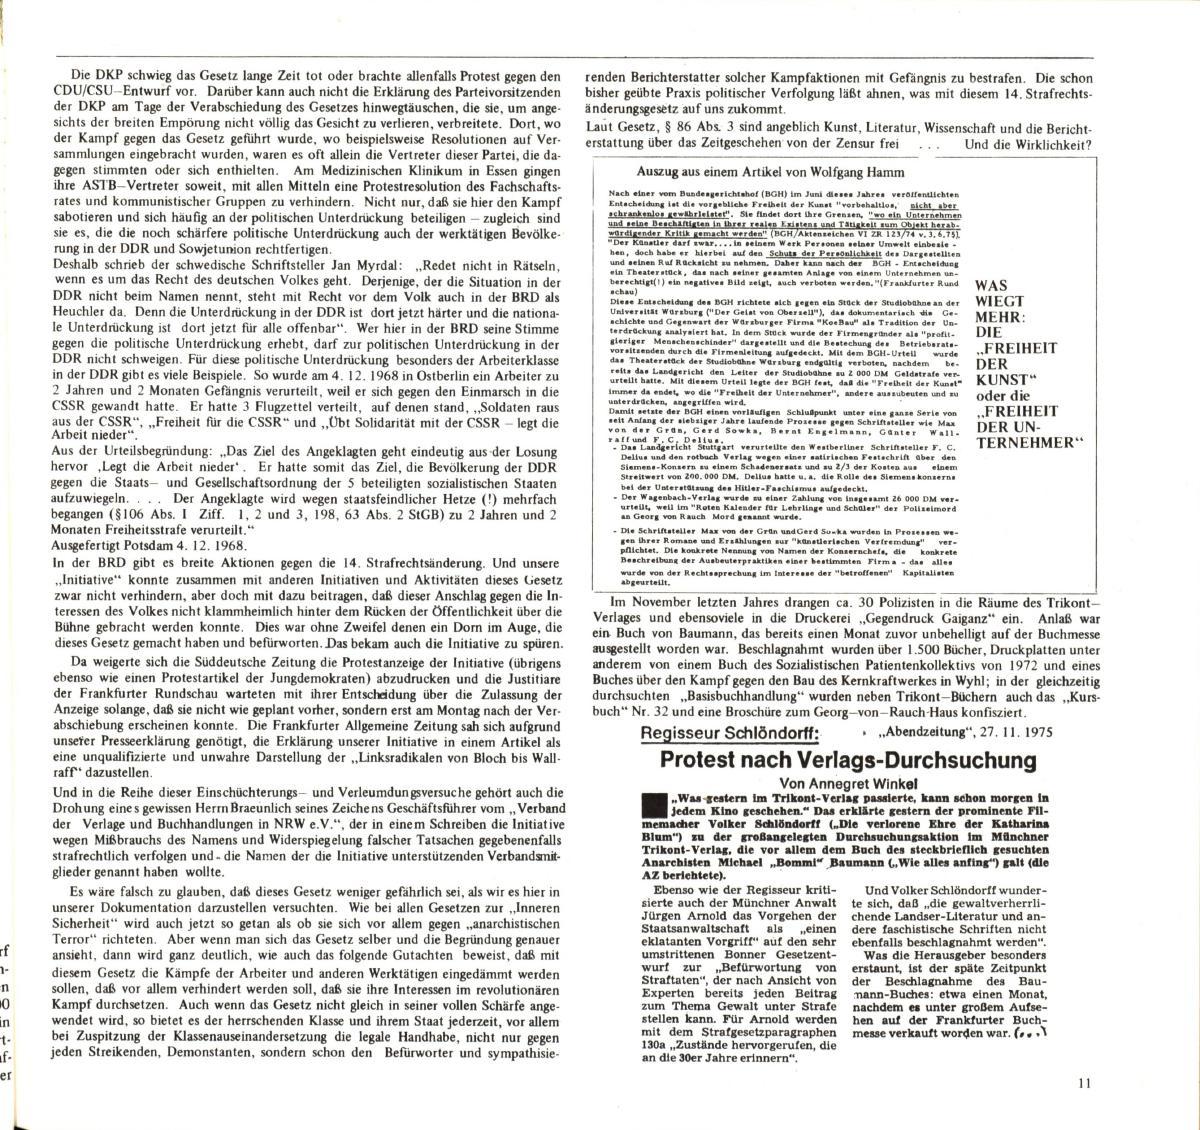 REP_VLB_1976_Die_Zensurgesetze_12